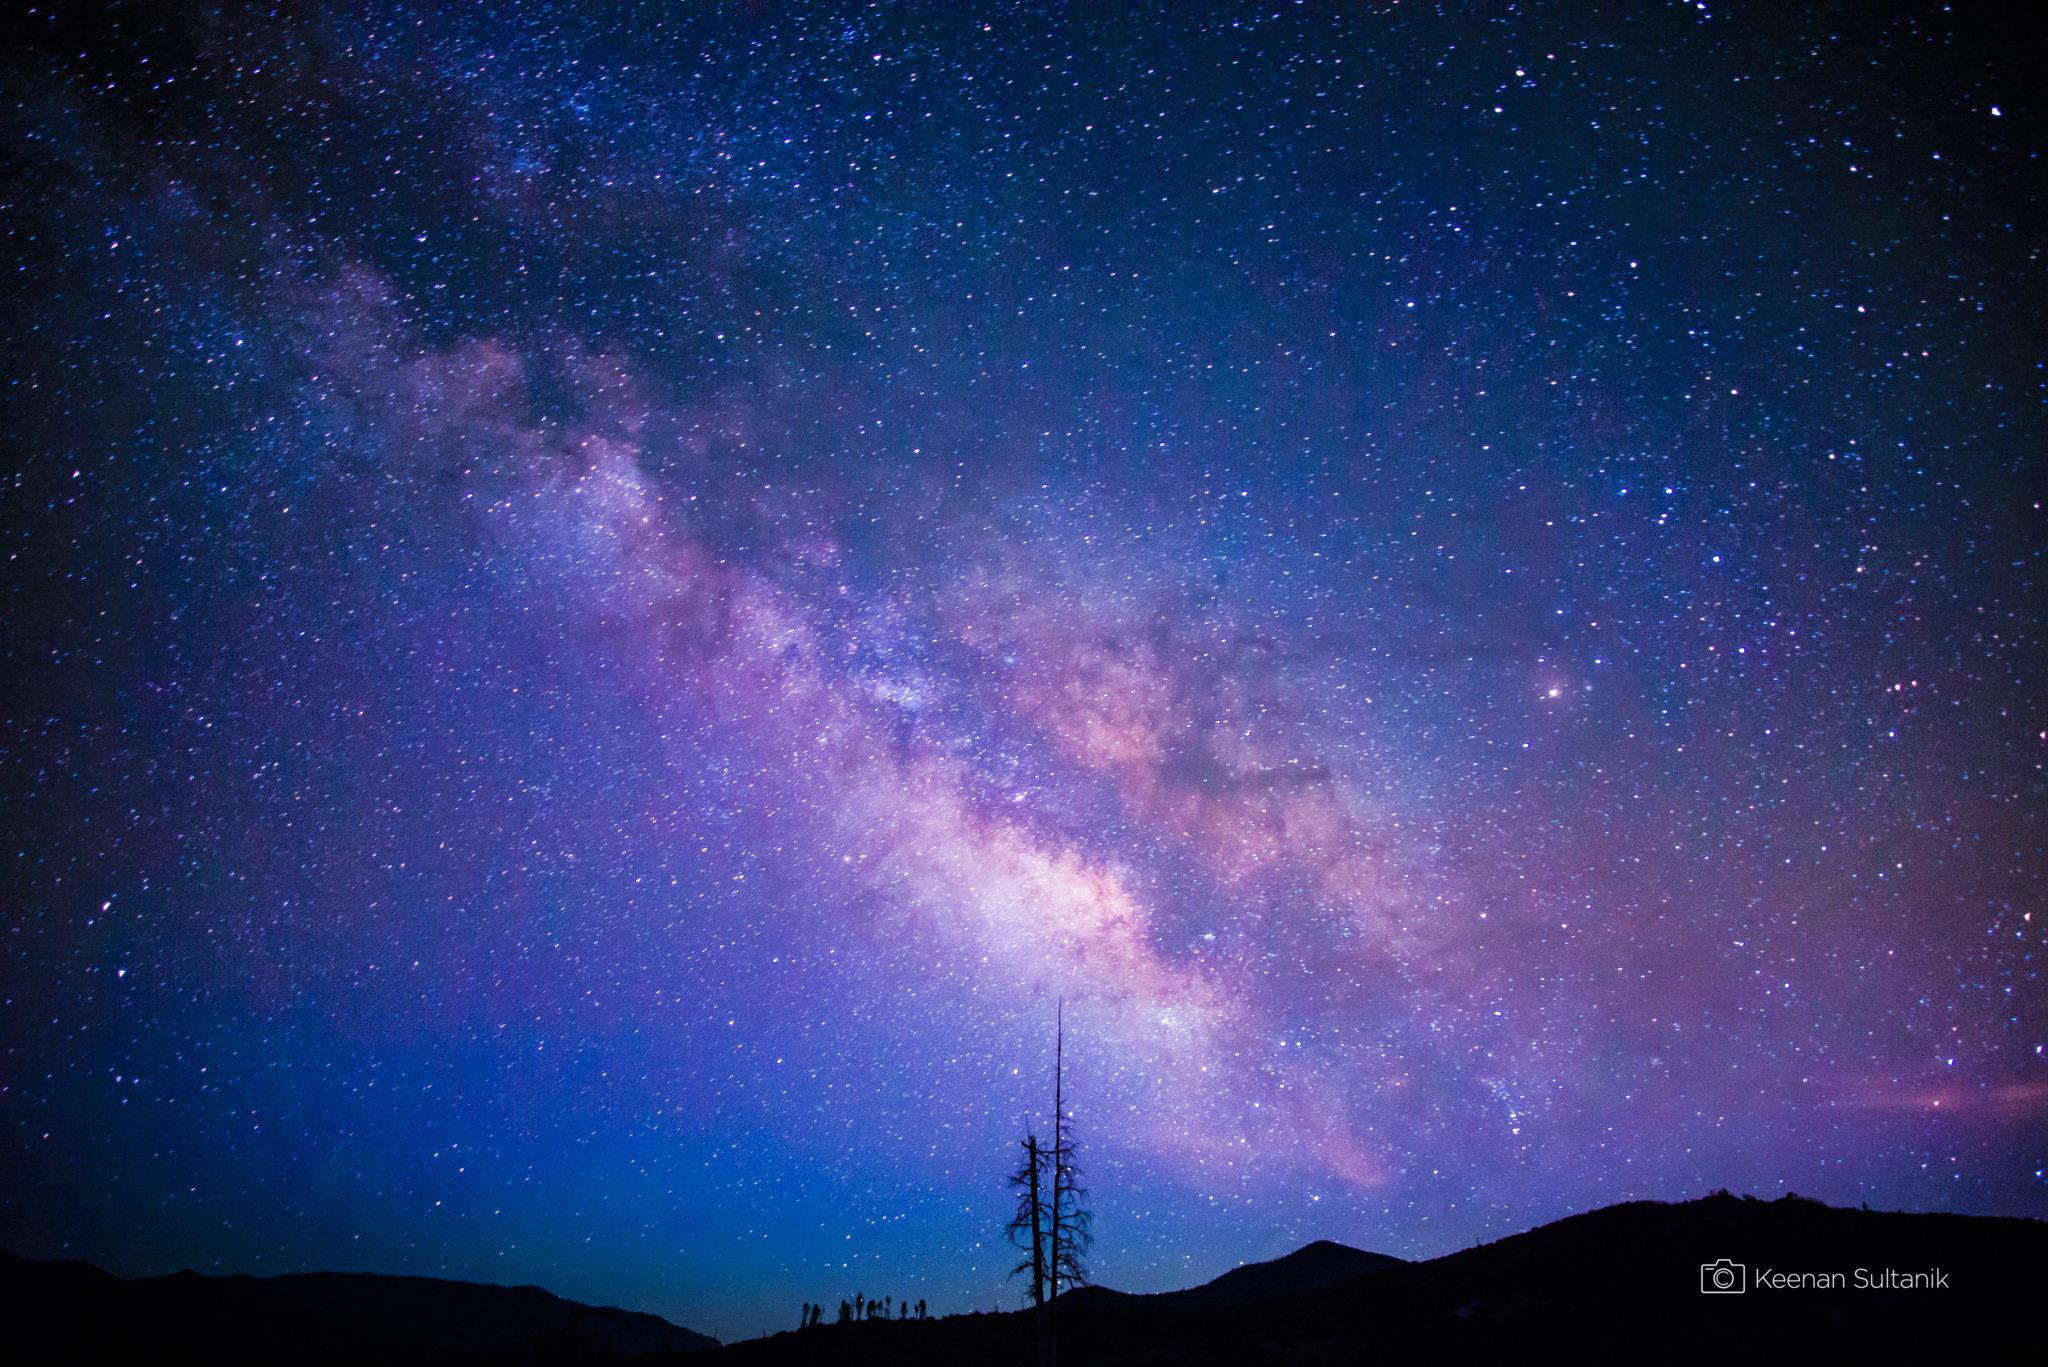 Tree Beneath the Milky Way